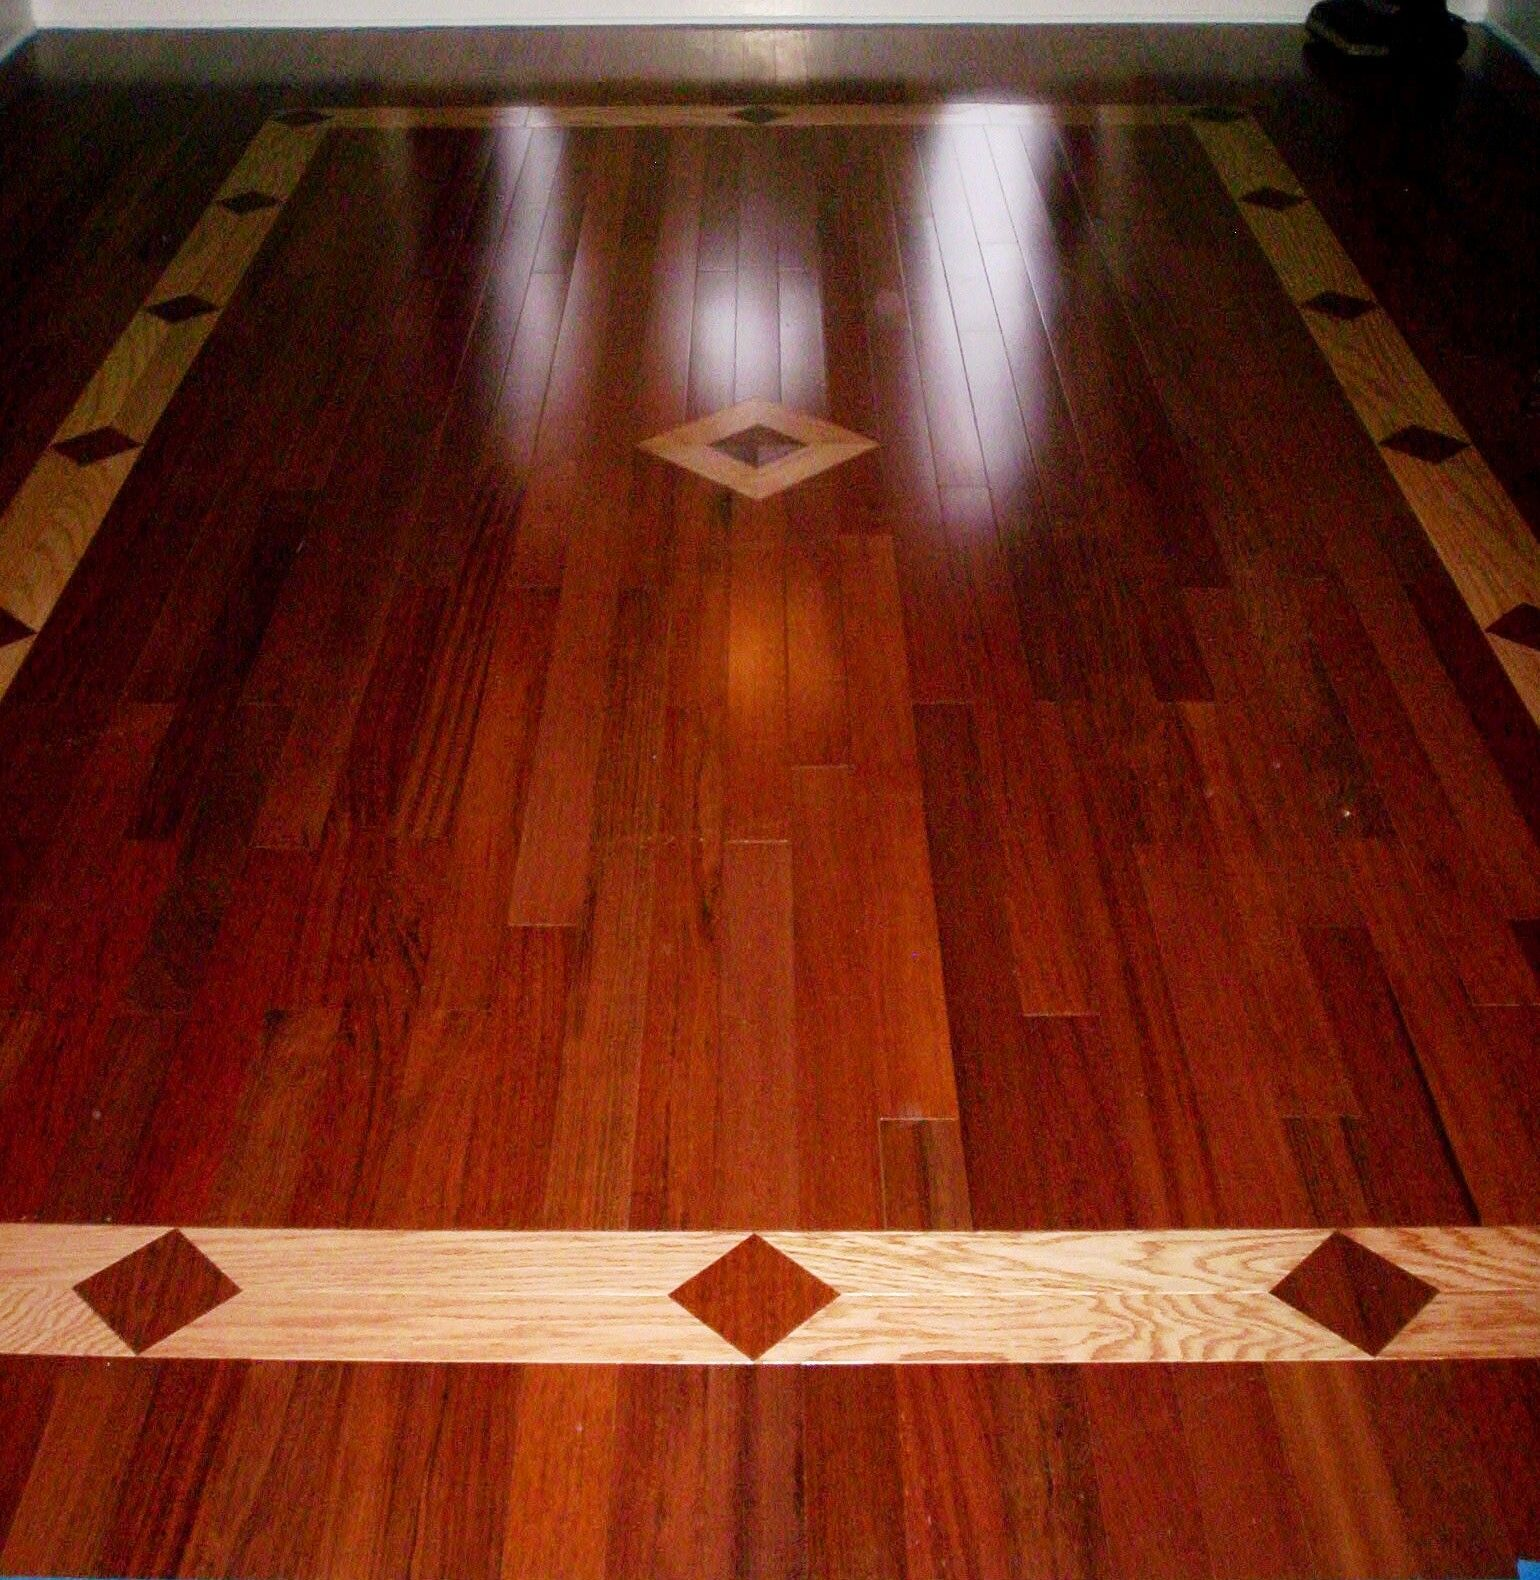 brazilian cherry hardwood floor with a red oak inlay